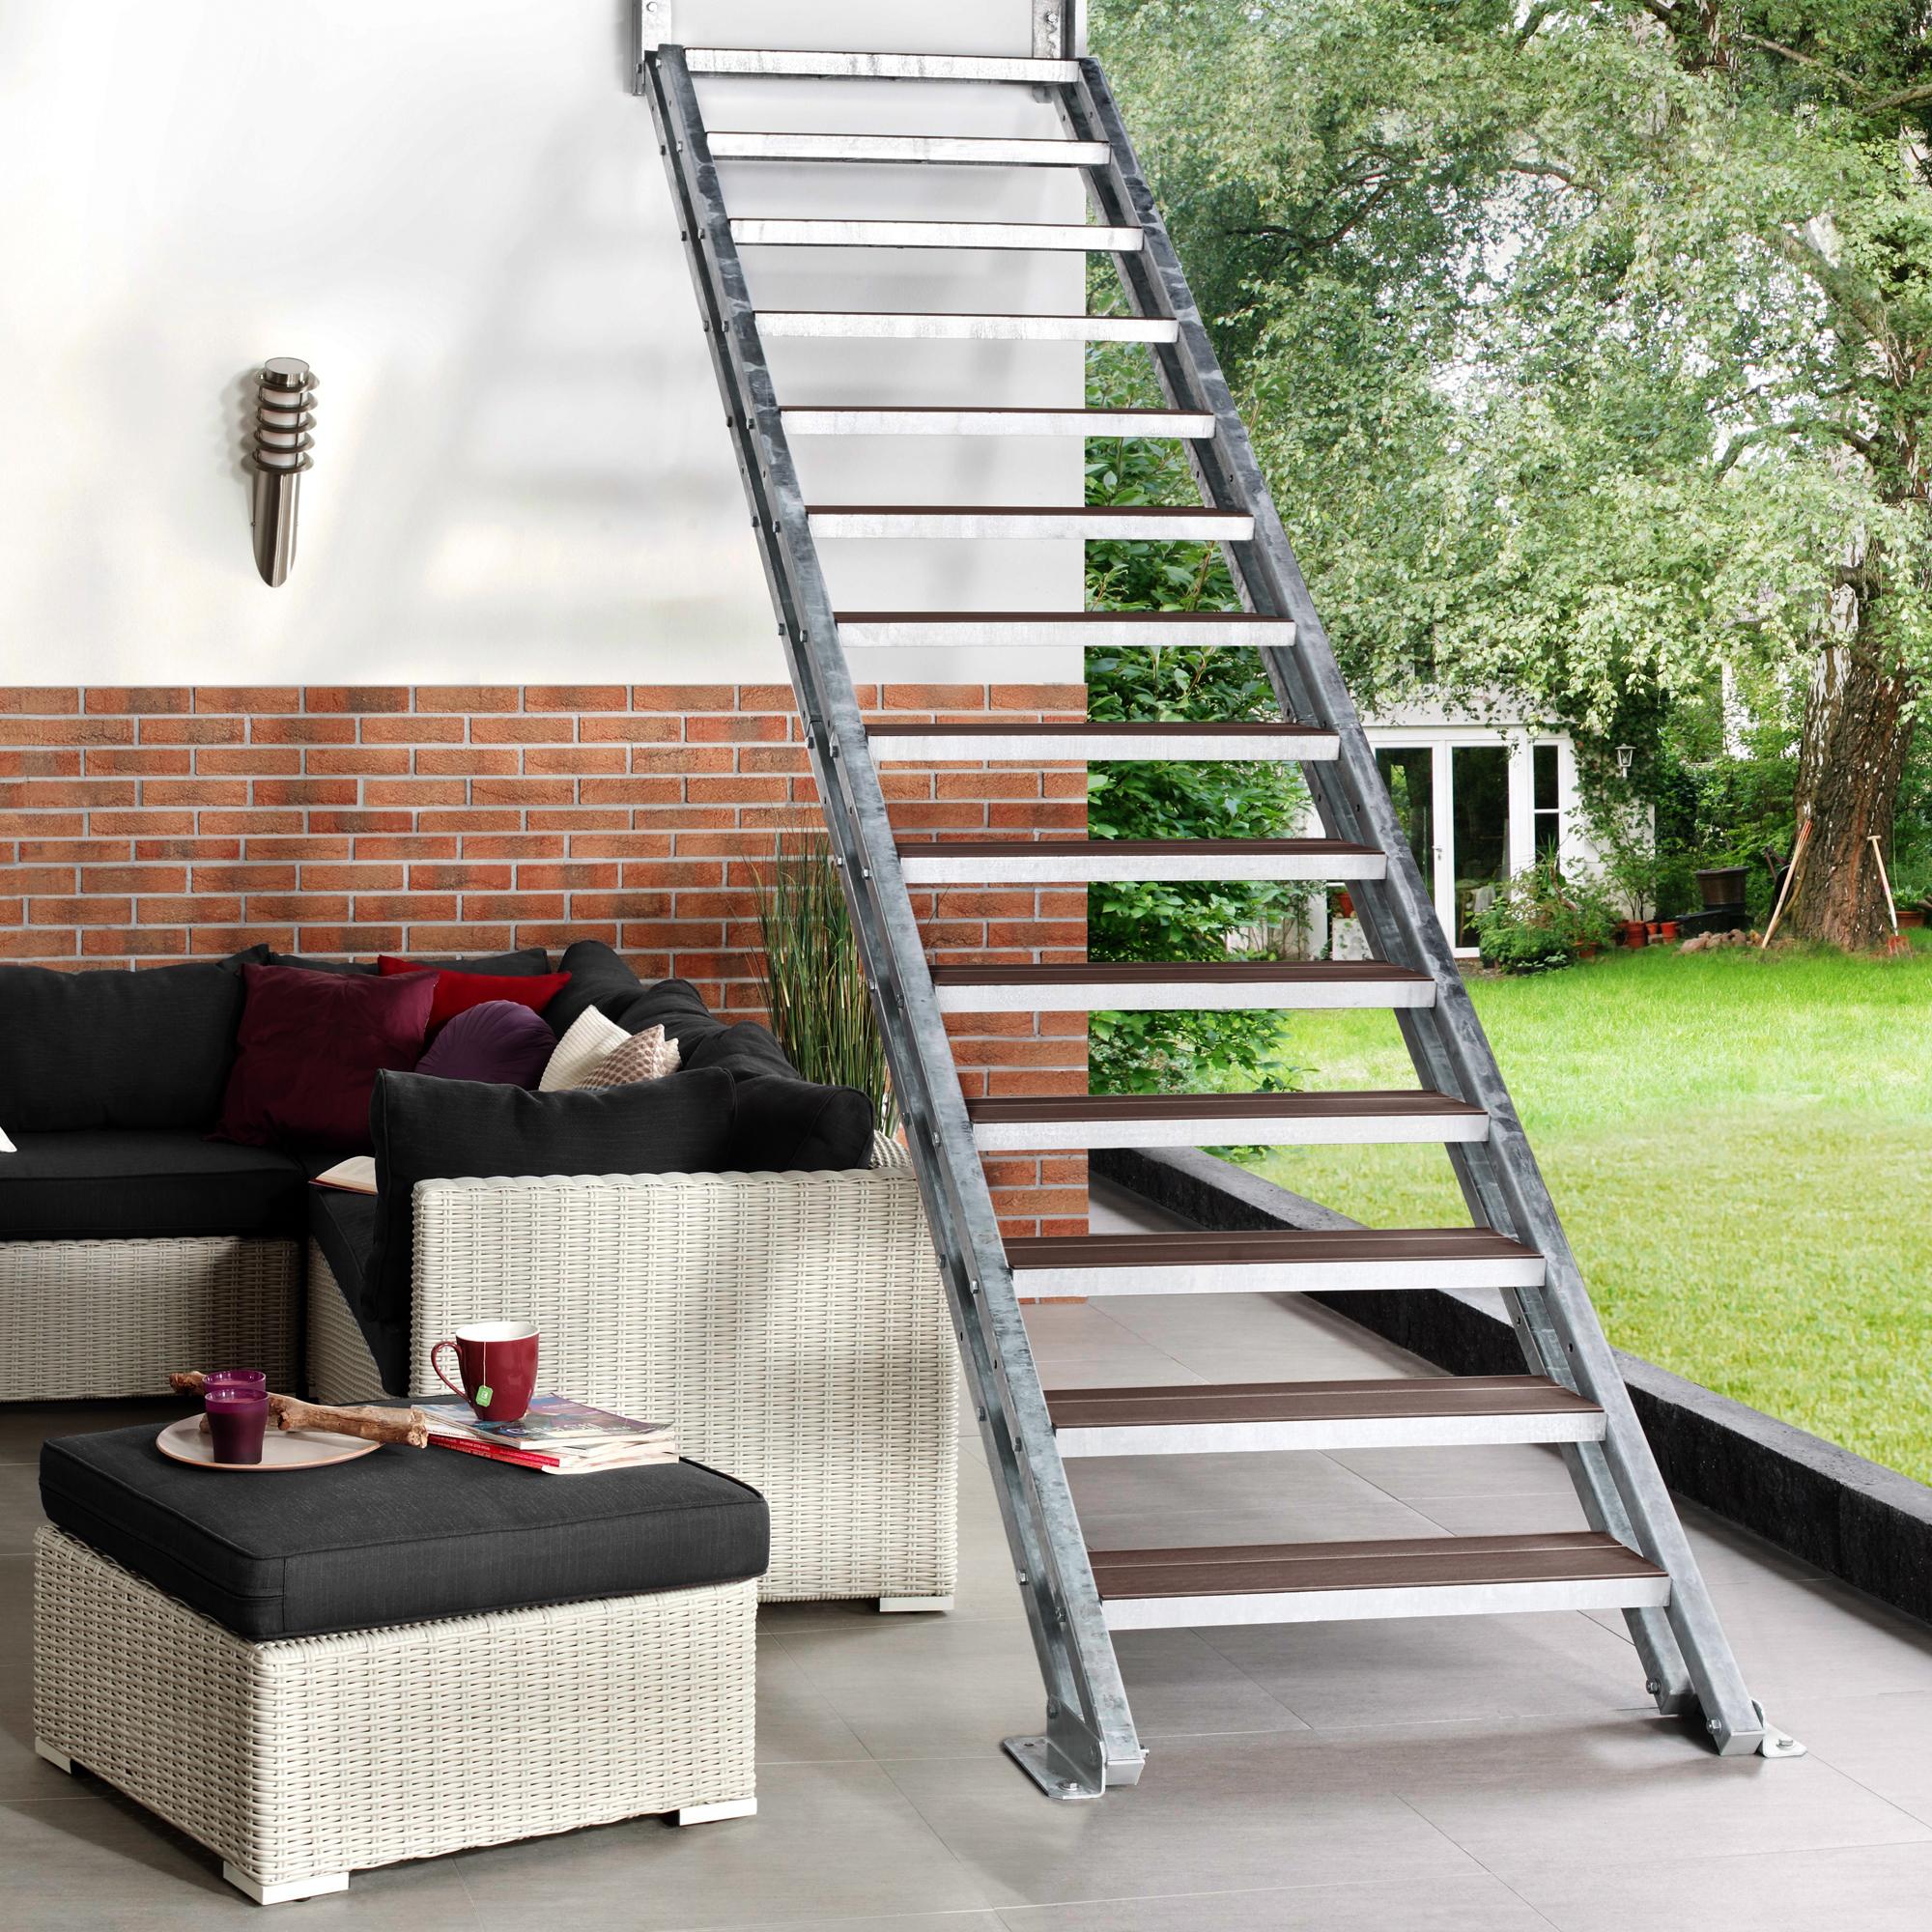 au entreppen mit wpc stufen als bausatz kaufen. Black Bedroom Furniture Sets. Home Design Ideas